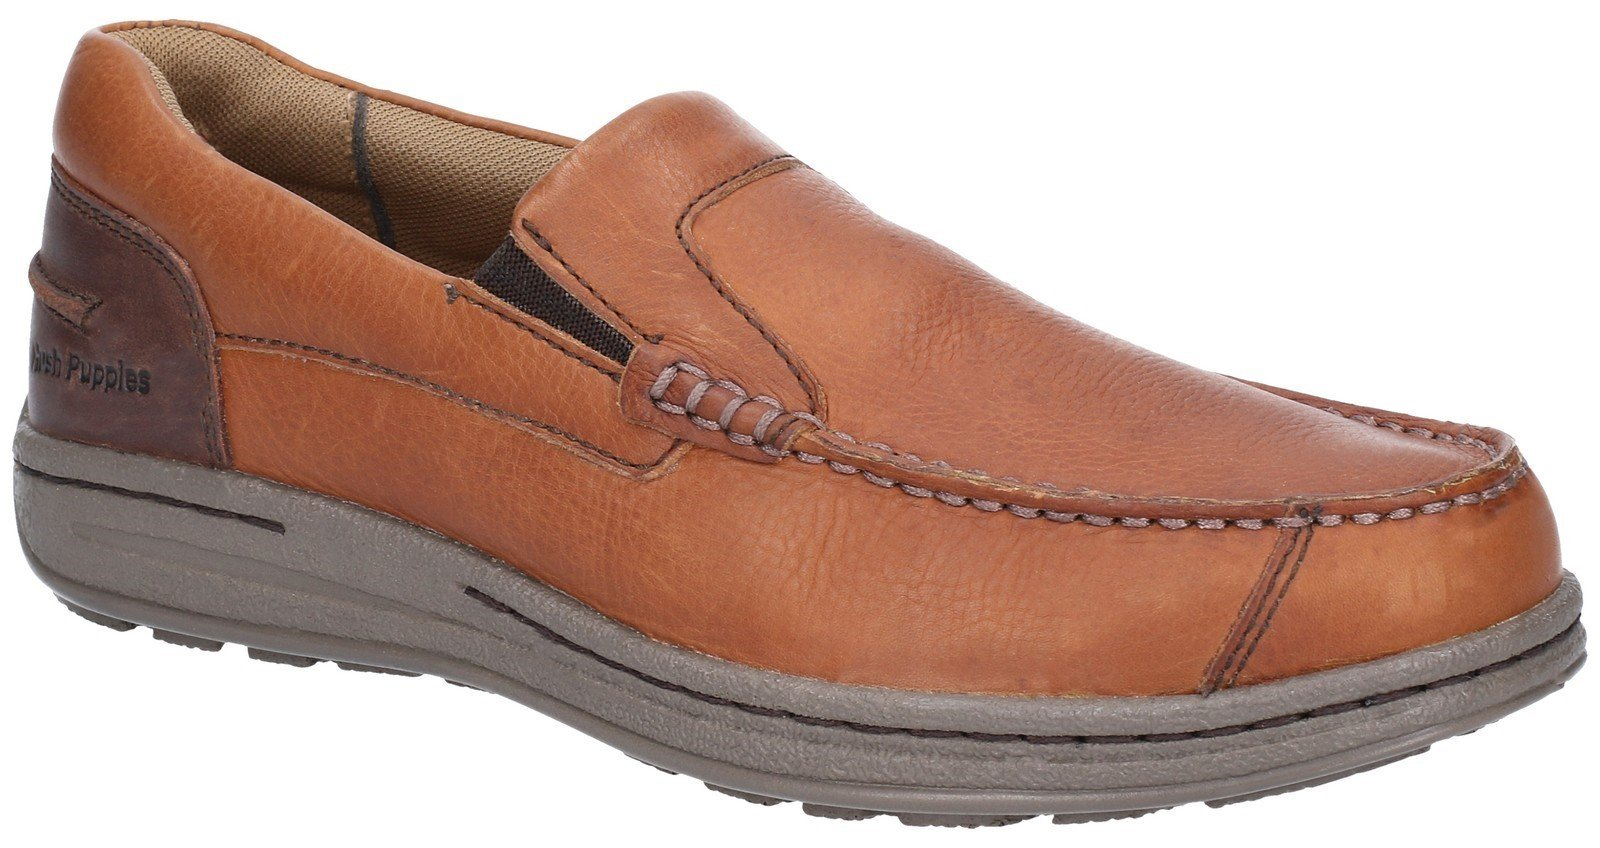 Hush Puppies Men's Murphy Victory Slip On Shoe Tan 28369 - Tan 6